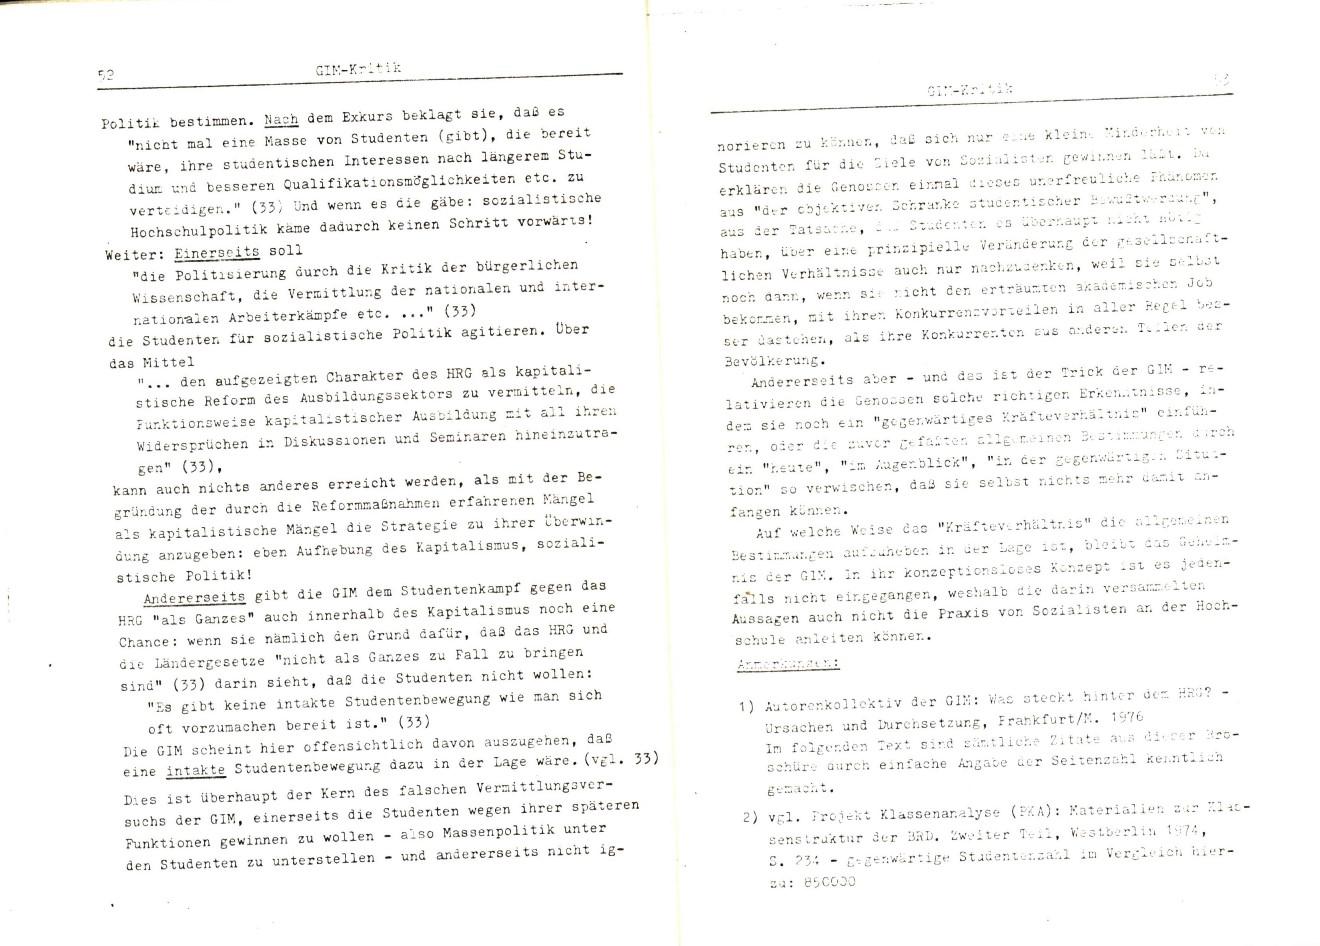 Muenster_SHO_1977_Studenteninteressen_27